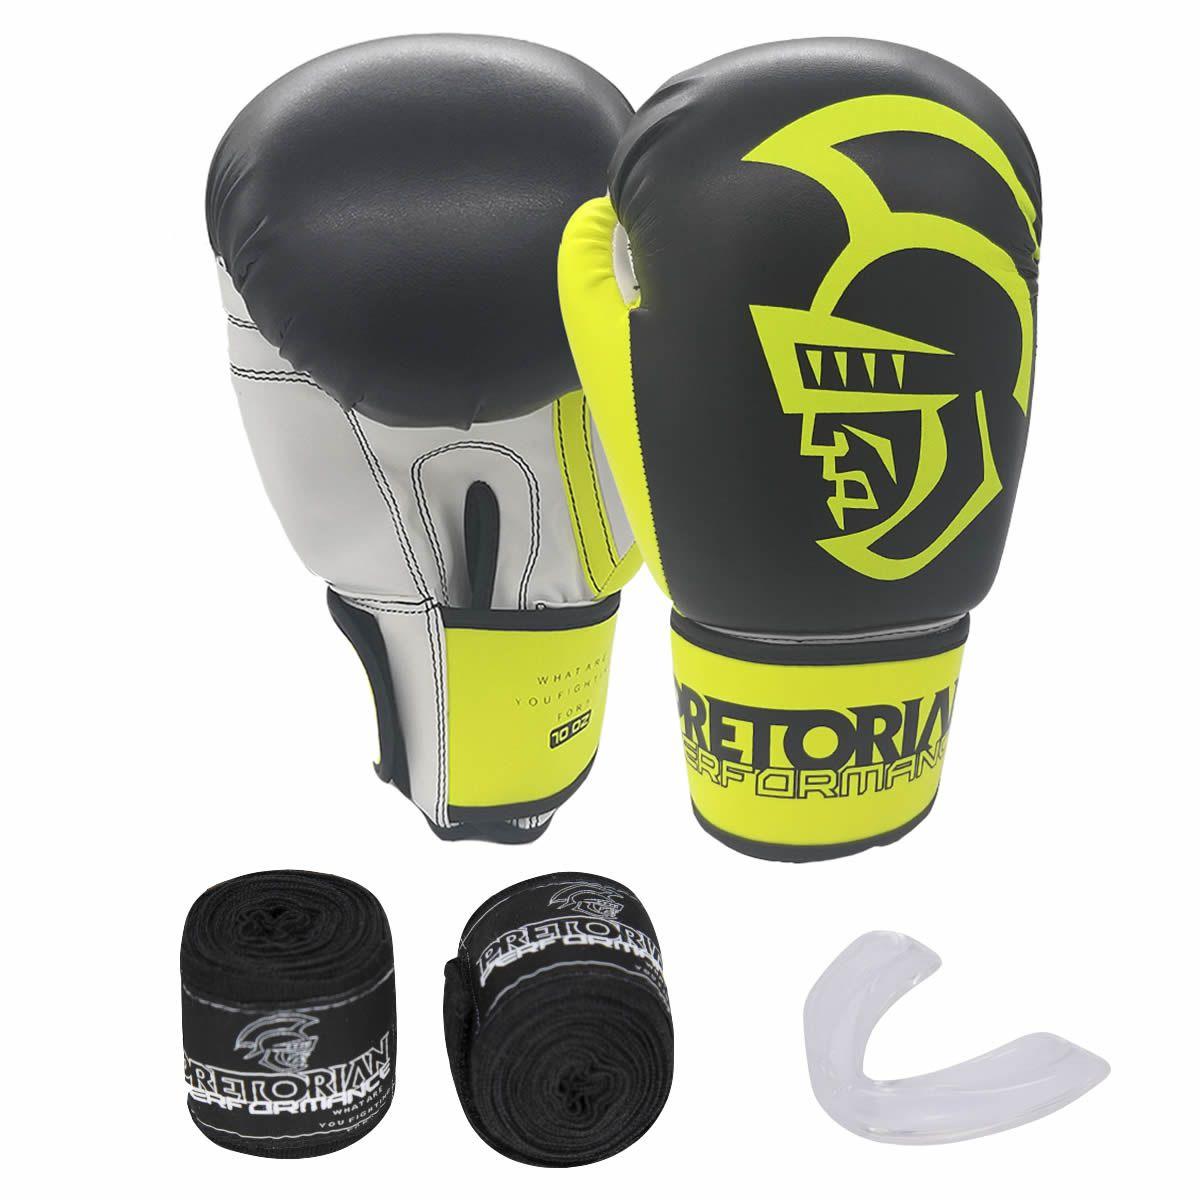 Kit de Boxe Thai Pretorian: Bandagem + Protetor Bucal + Luvas de Boxe Performance - Amarela - 12 / 14 OZ